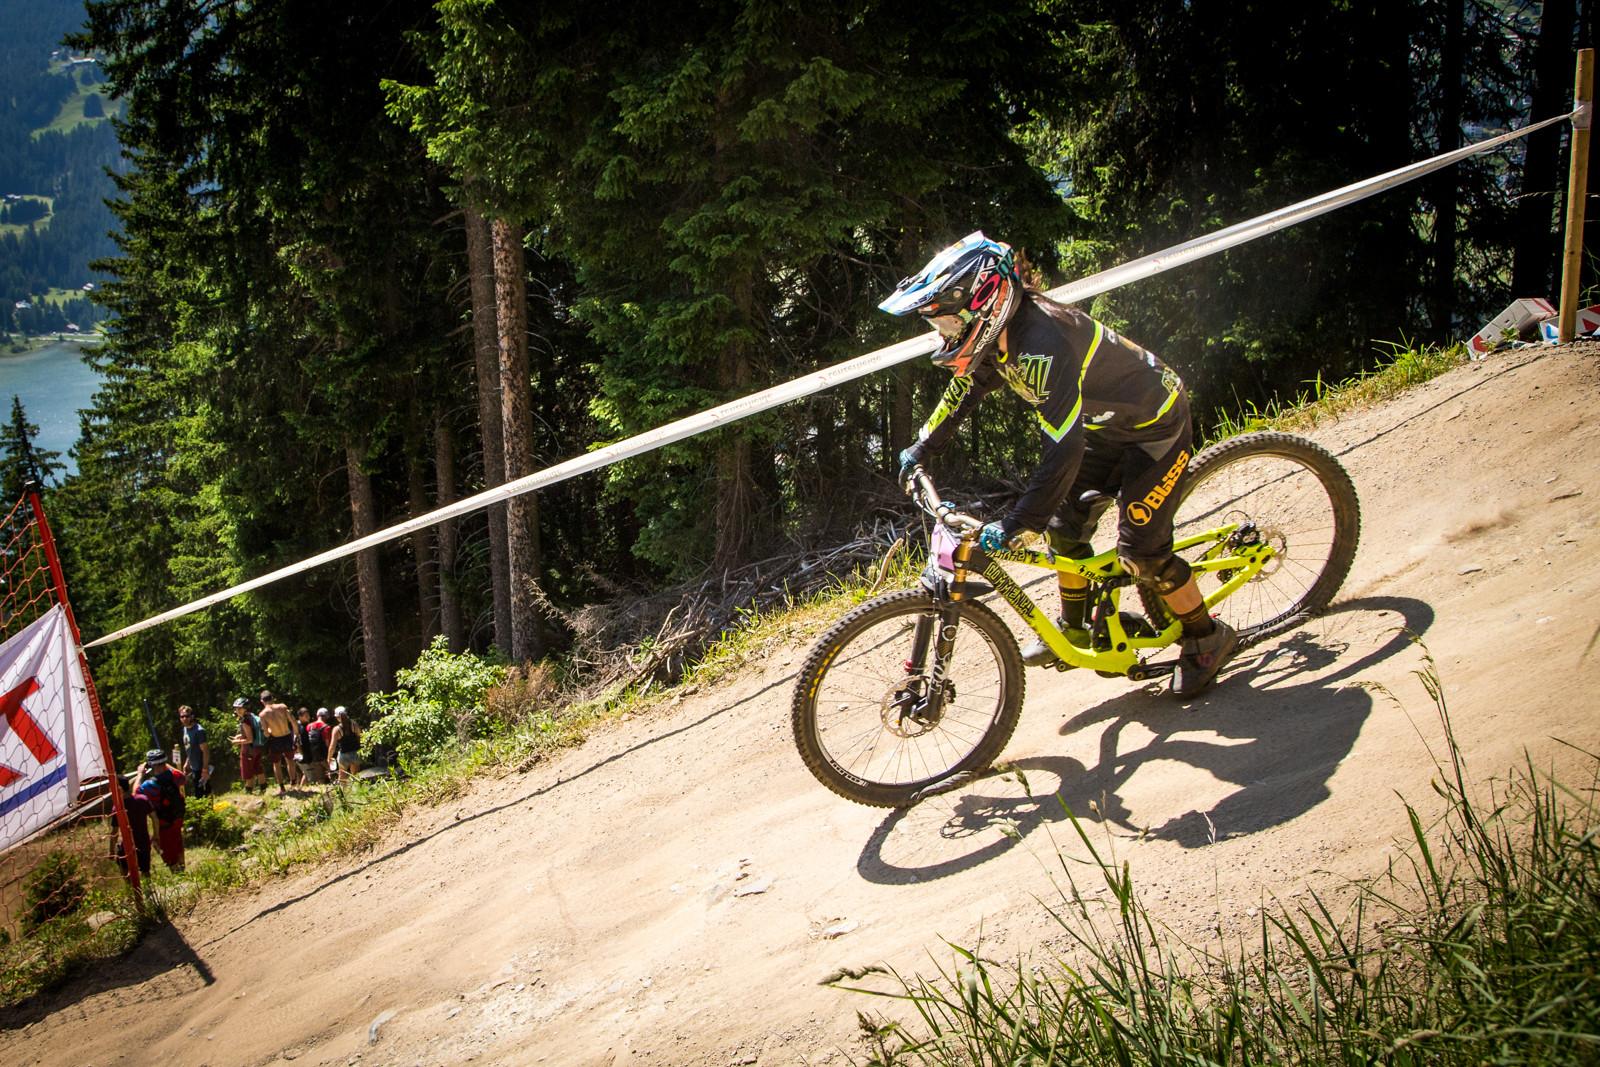 G-Out Project, Lenzerheide World Cup, Commencal Supreme DH - G-Out Project - Lenzerheide World Cup - Mountain Biking Pictures - Vital MTB